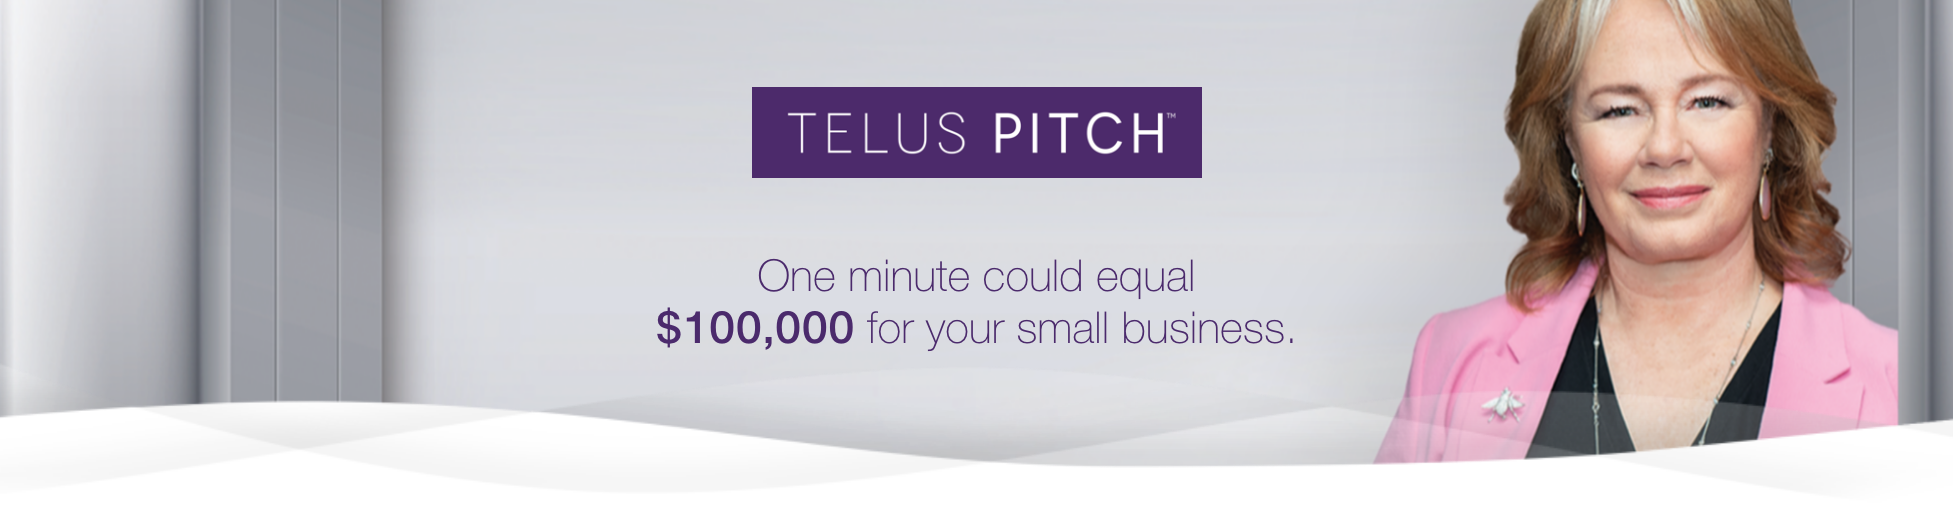 Telus Pitch poster